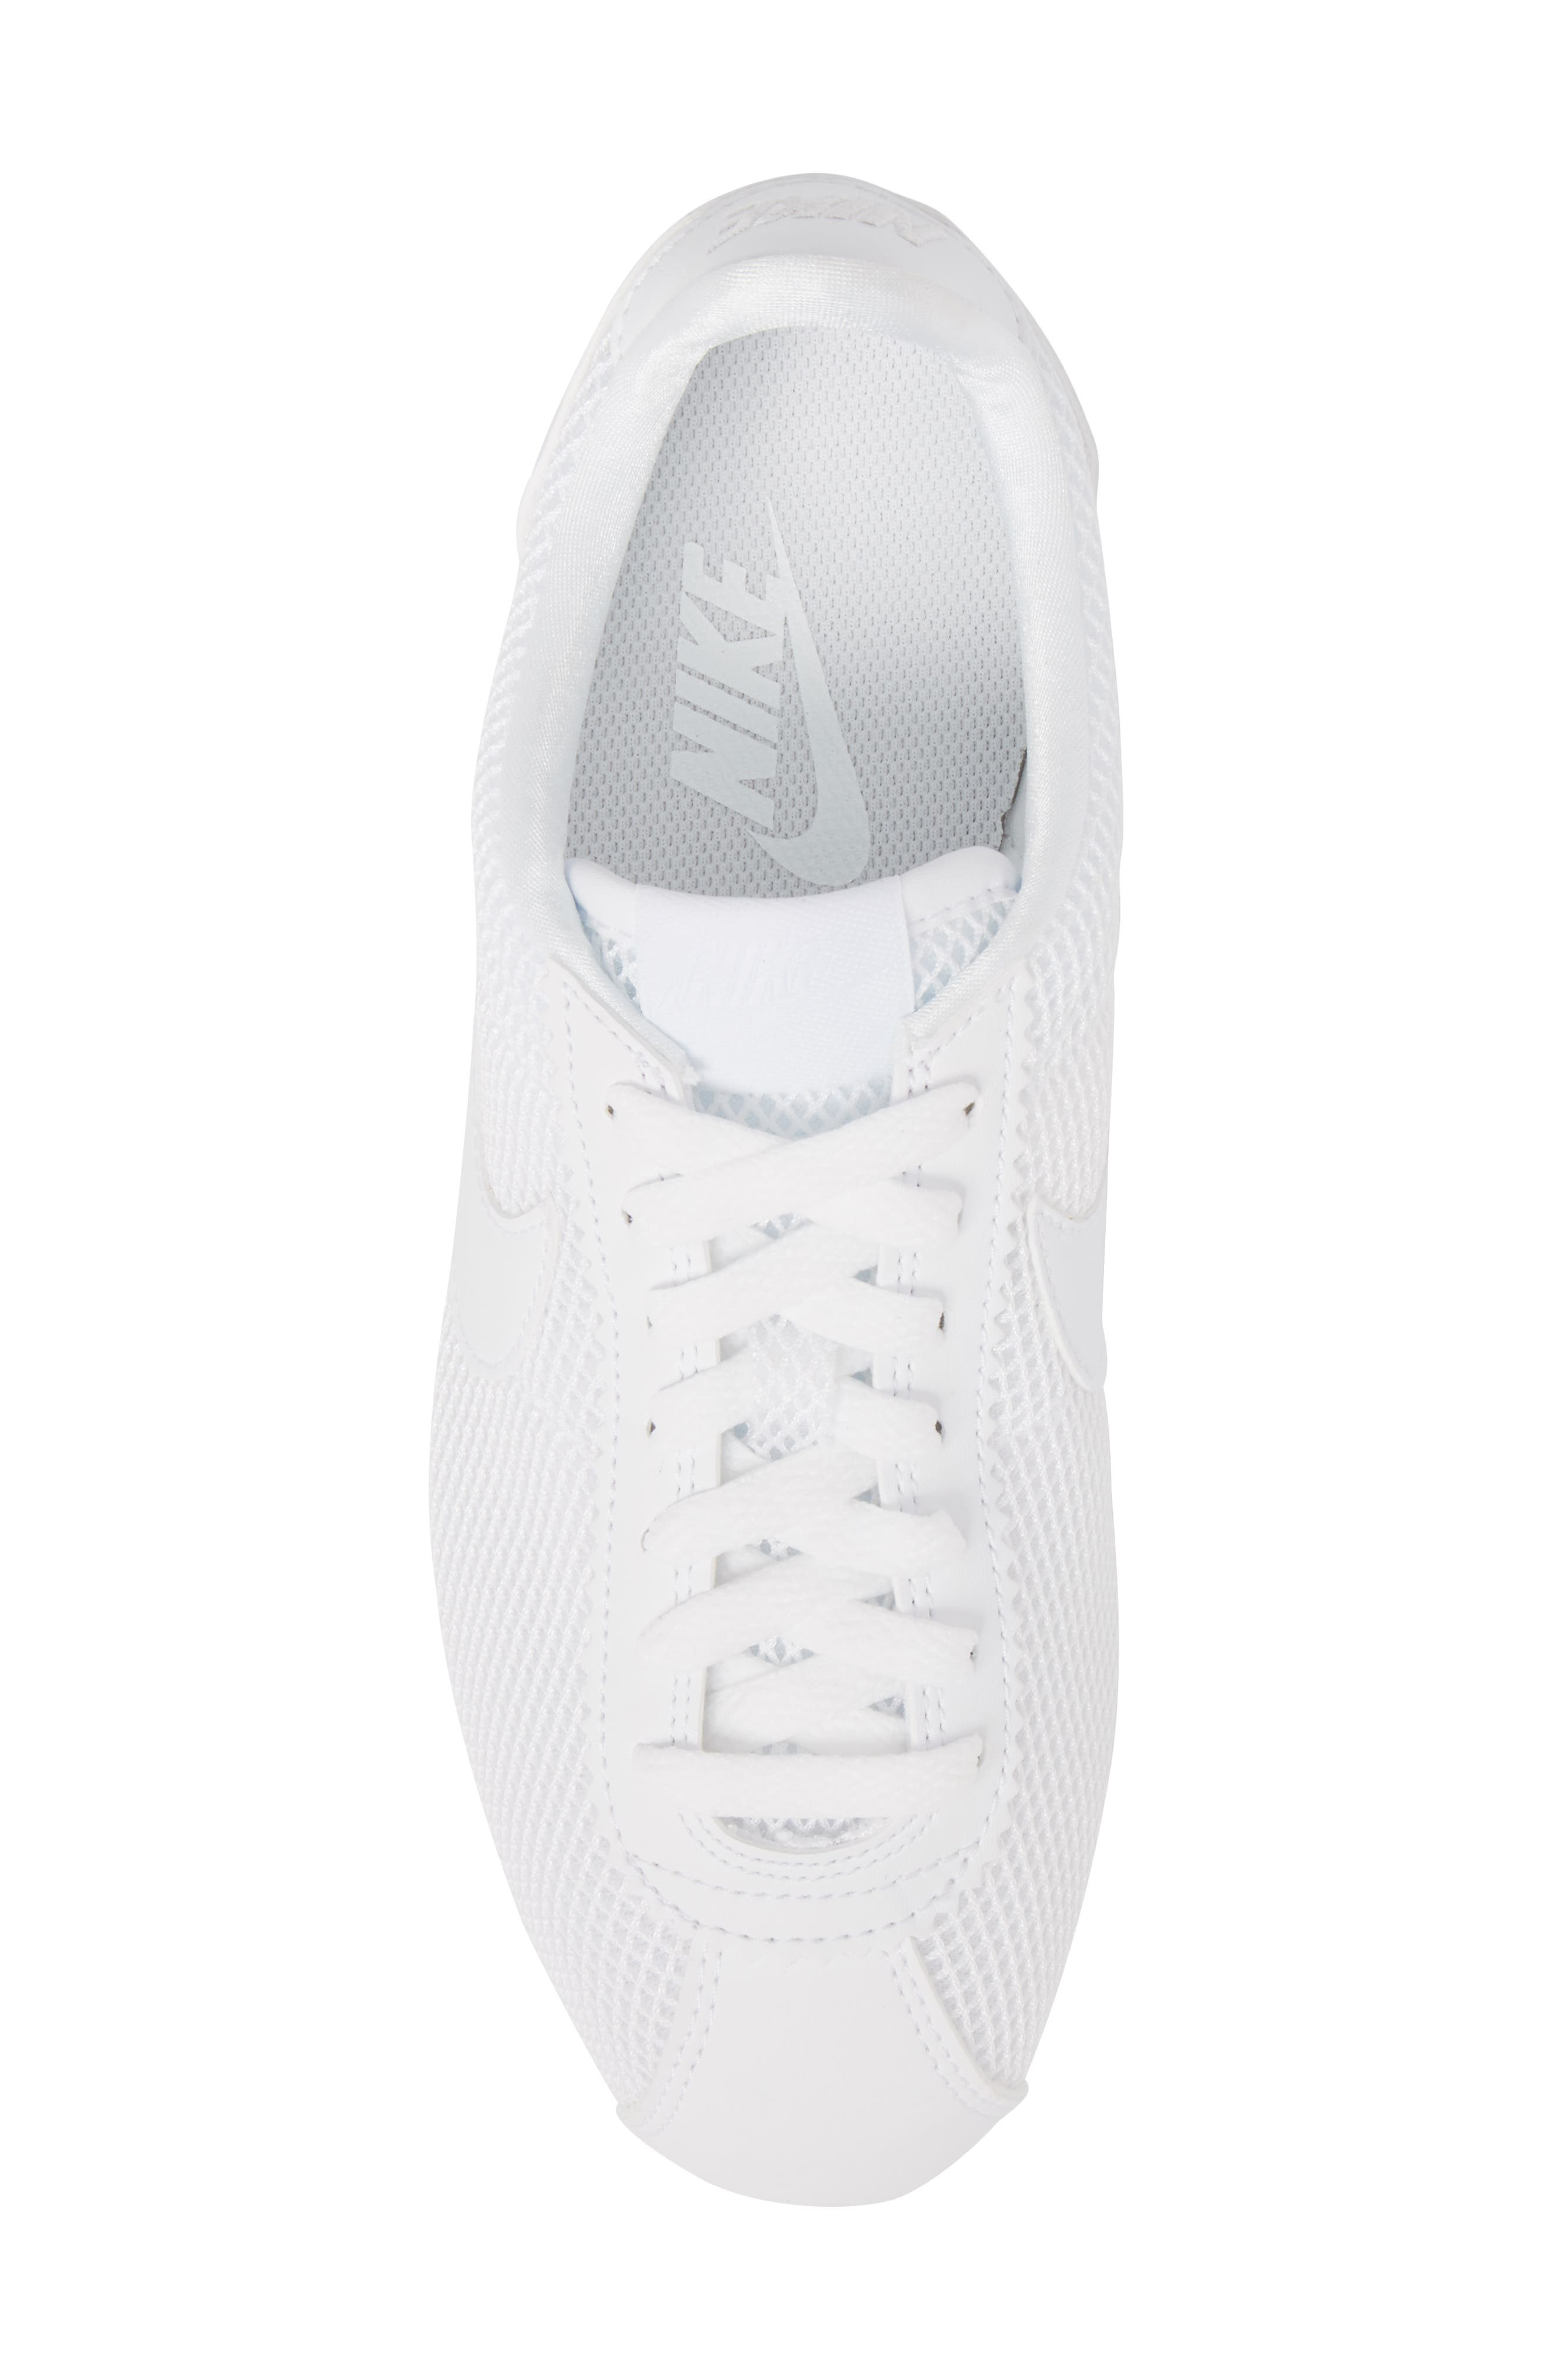 Classic Cortez Premium XLV Sneaker,                             Alternate thumbnail 5, color,                             White/ White